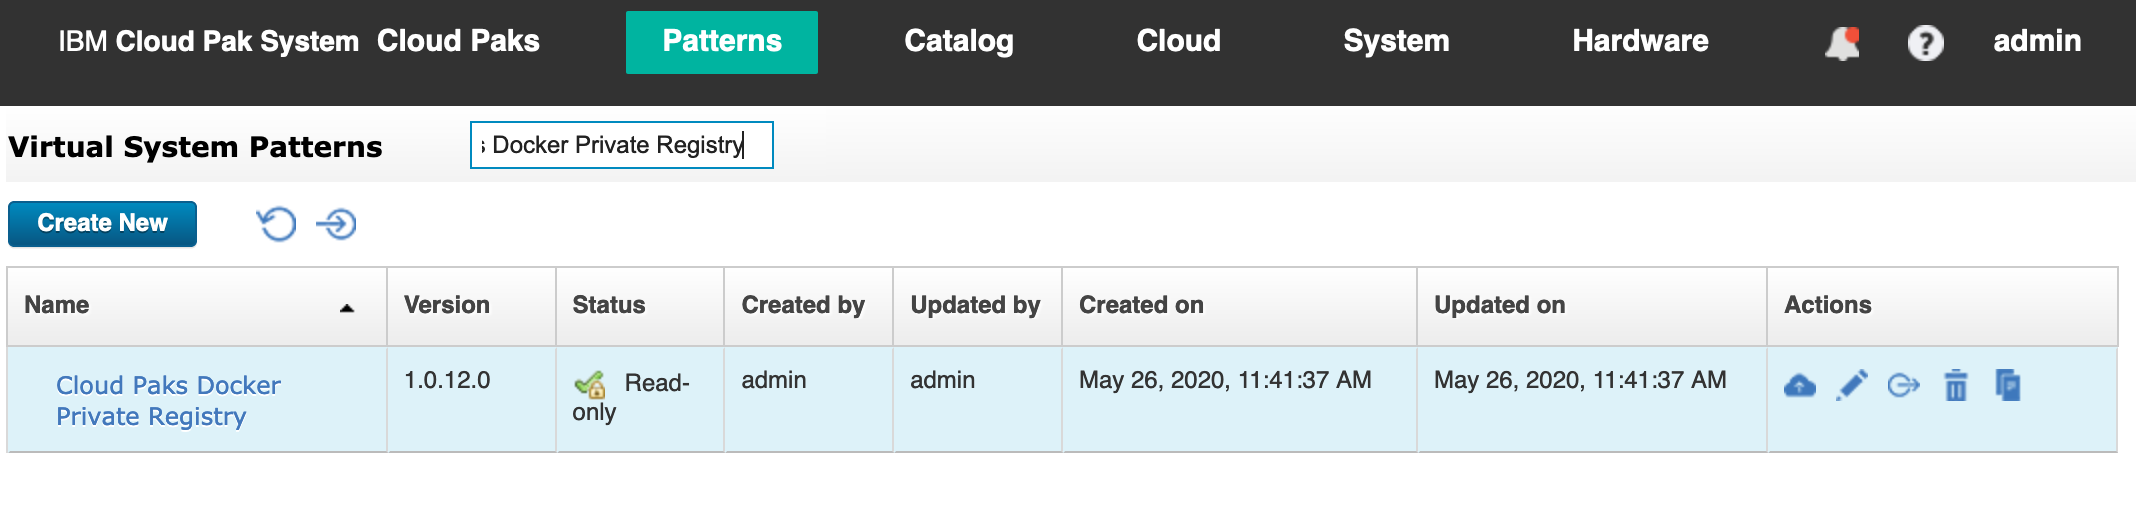 Cloud Paks Docker Private Registry virtual system pattern in IBM Cloud Pak System